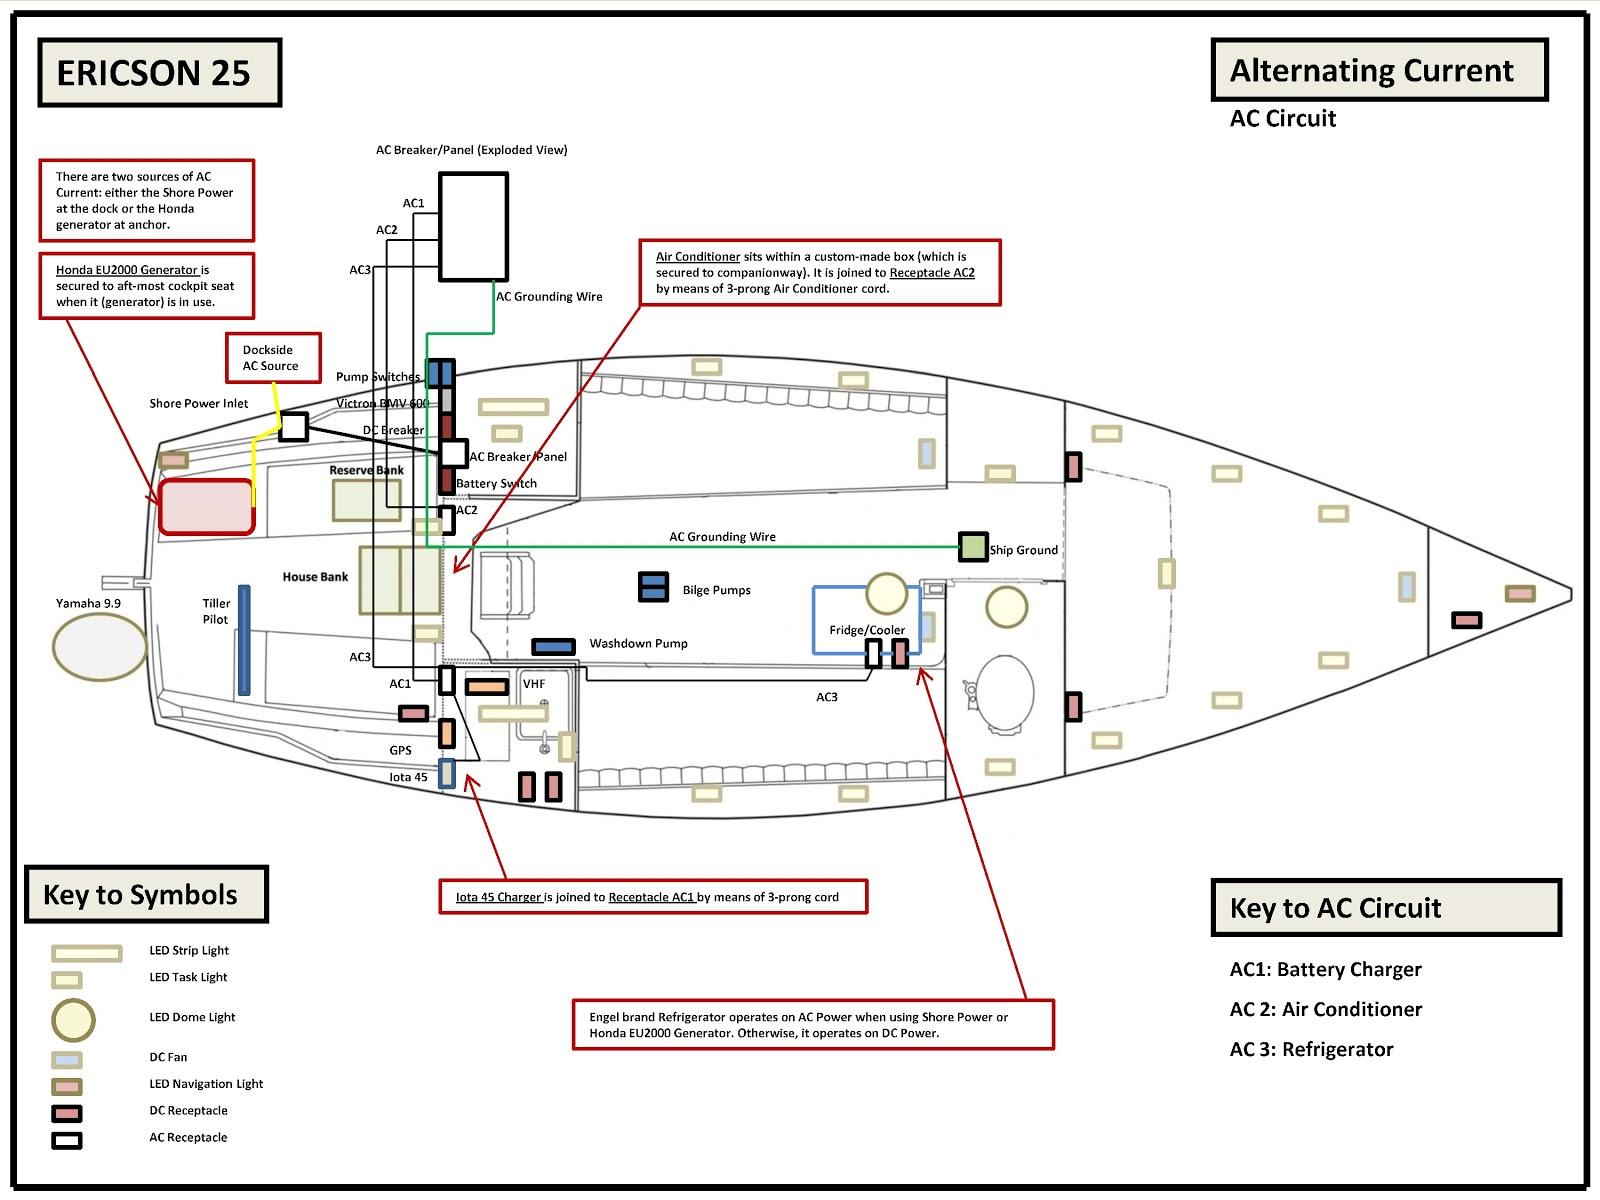 electrical diagram new ac circuit [ 1600 x 1200 Pixel ]